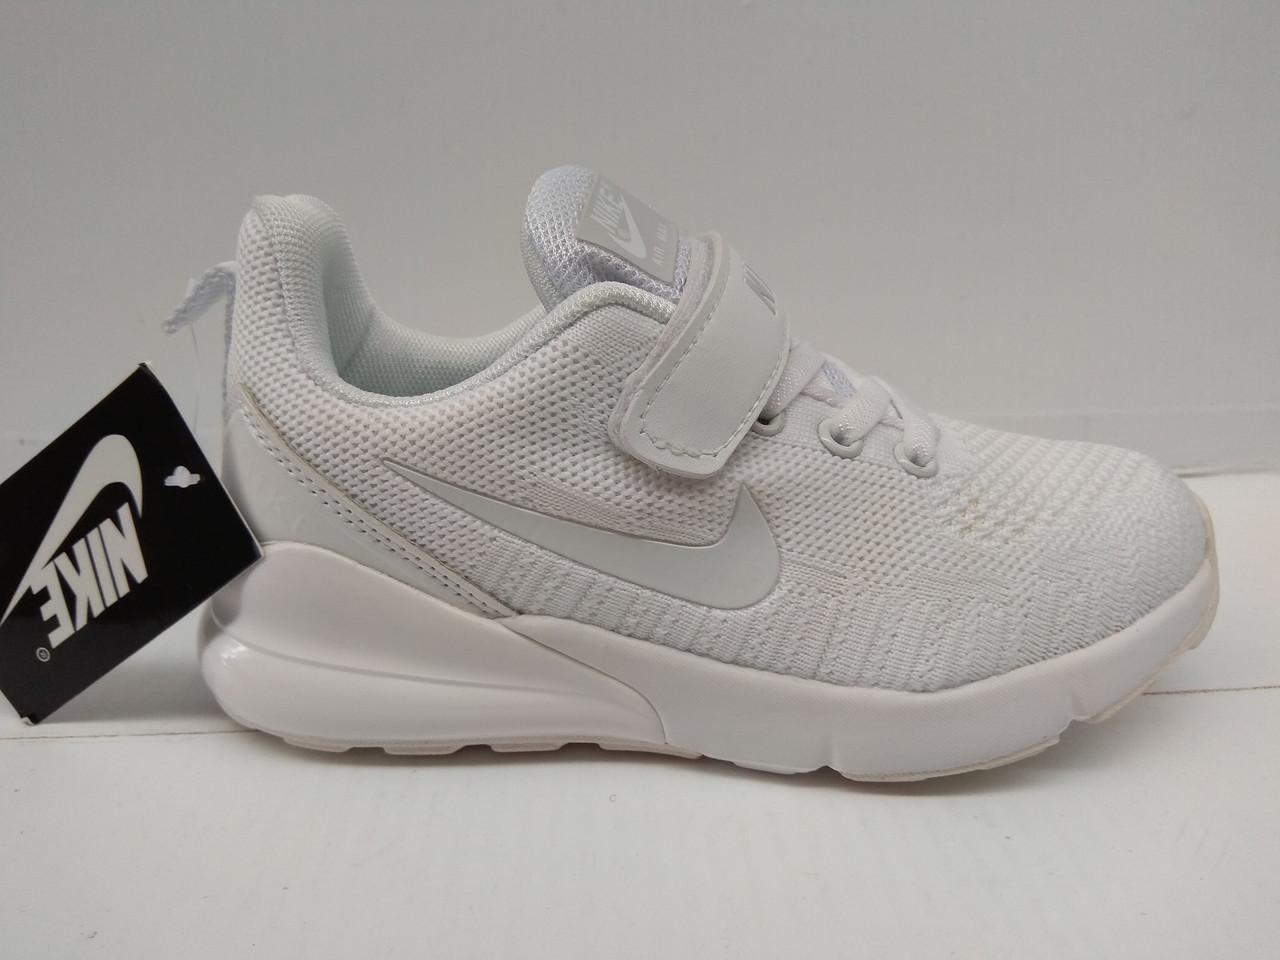 306c5027c Кроссовки Nike оптом E3539-3 (р.32-37) реплика Вьетнам, цена 425 грн ...